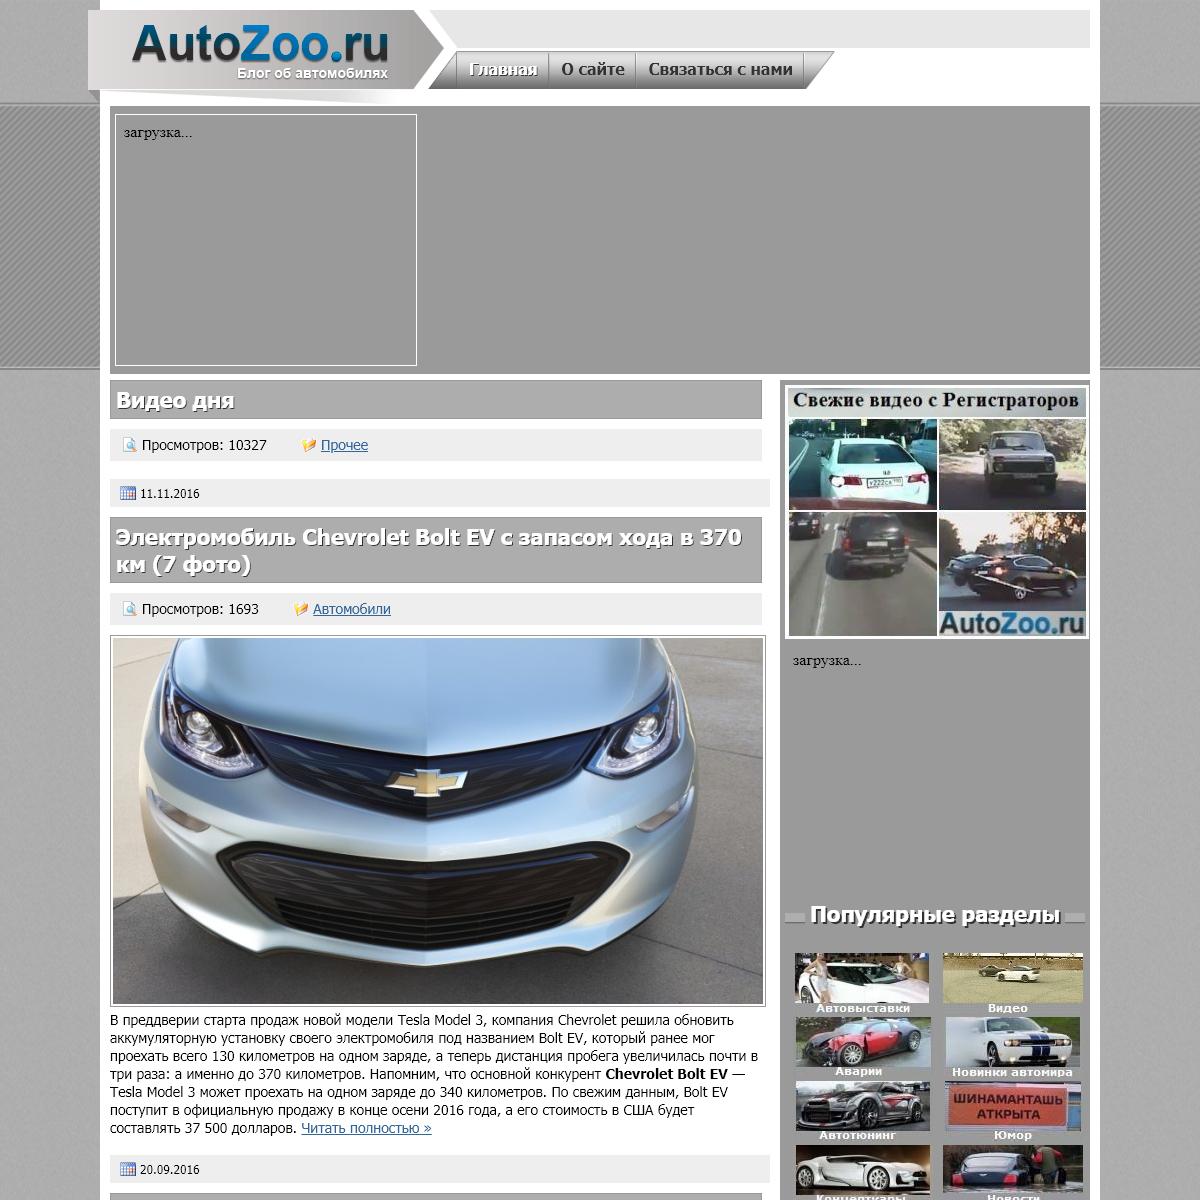 AutoZoo.Ru - Блог об автомобилях, транспорте и новинках авто мира